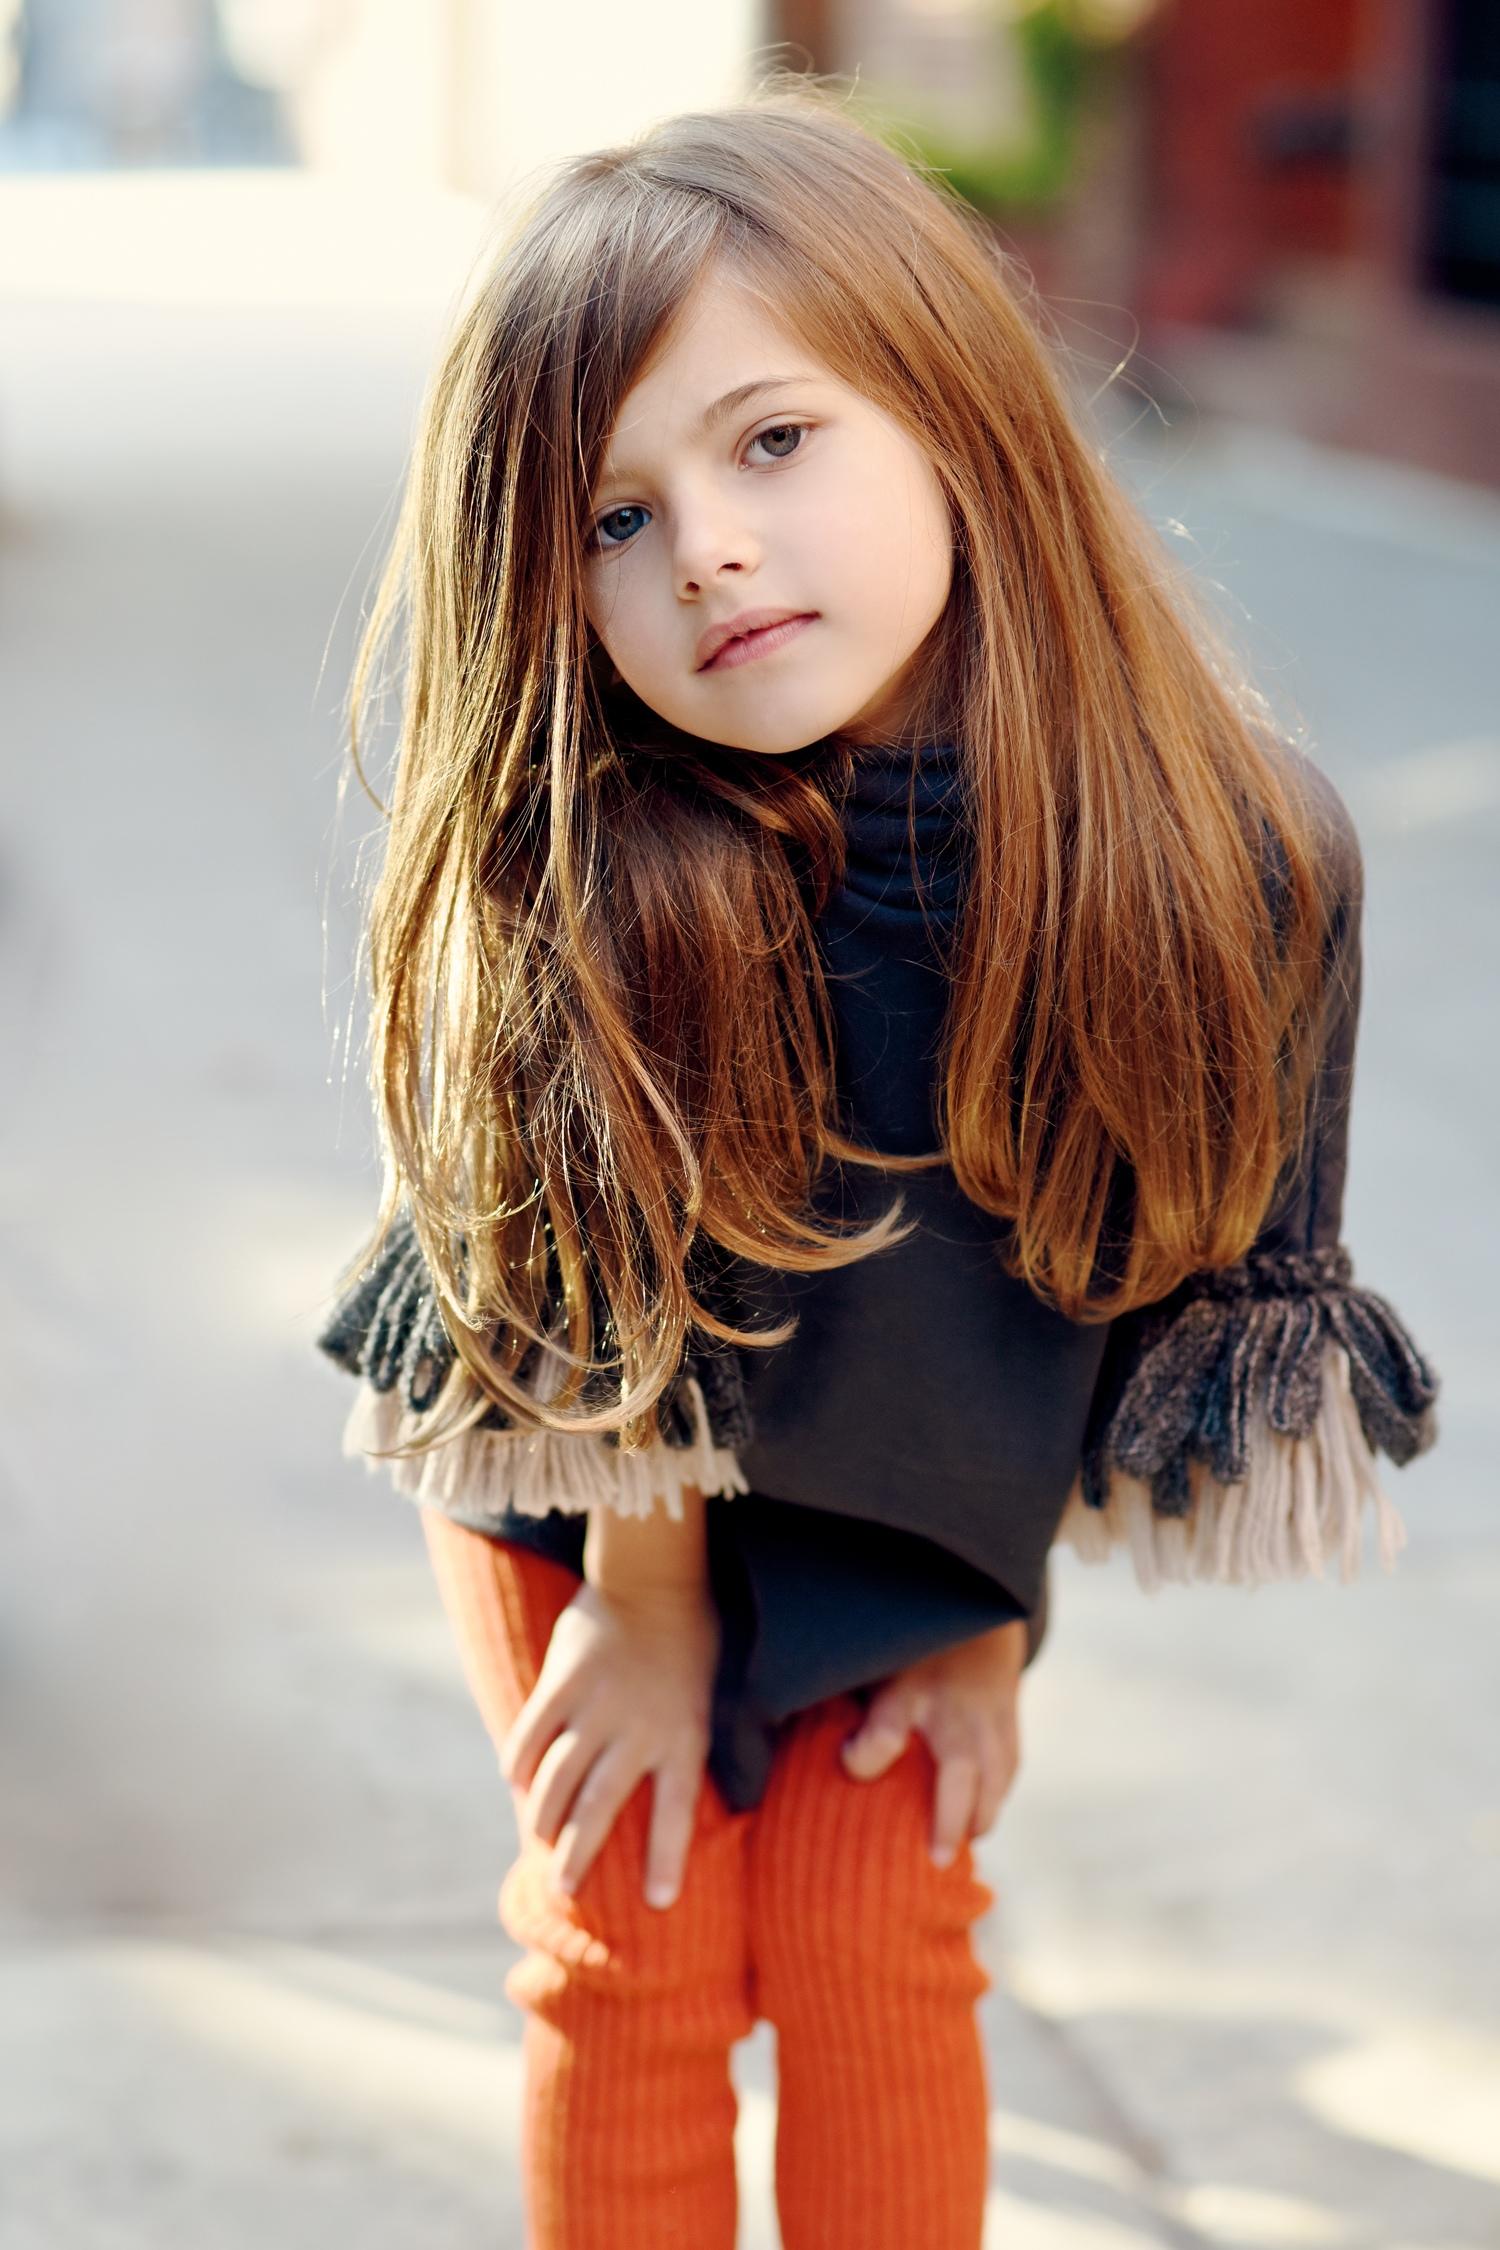 Enfant+Street+Style+by+Gina+Kim+Photography-26.jpeg